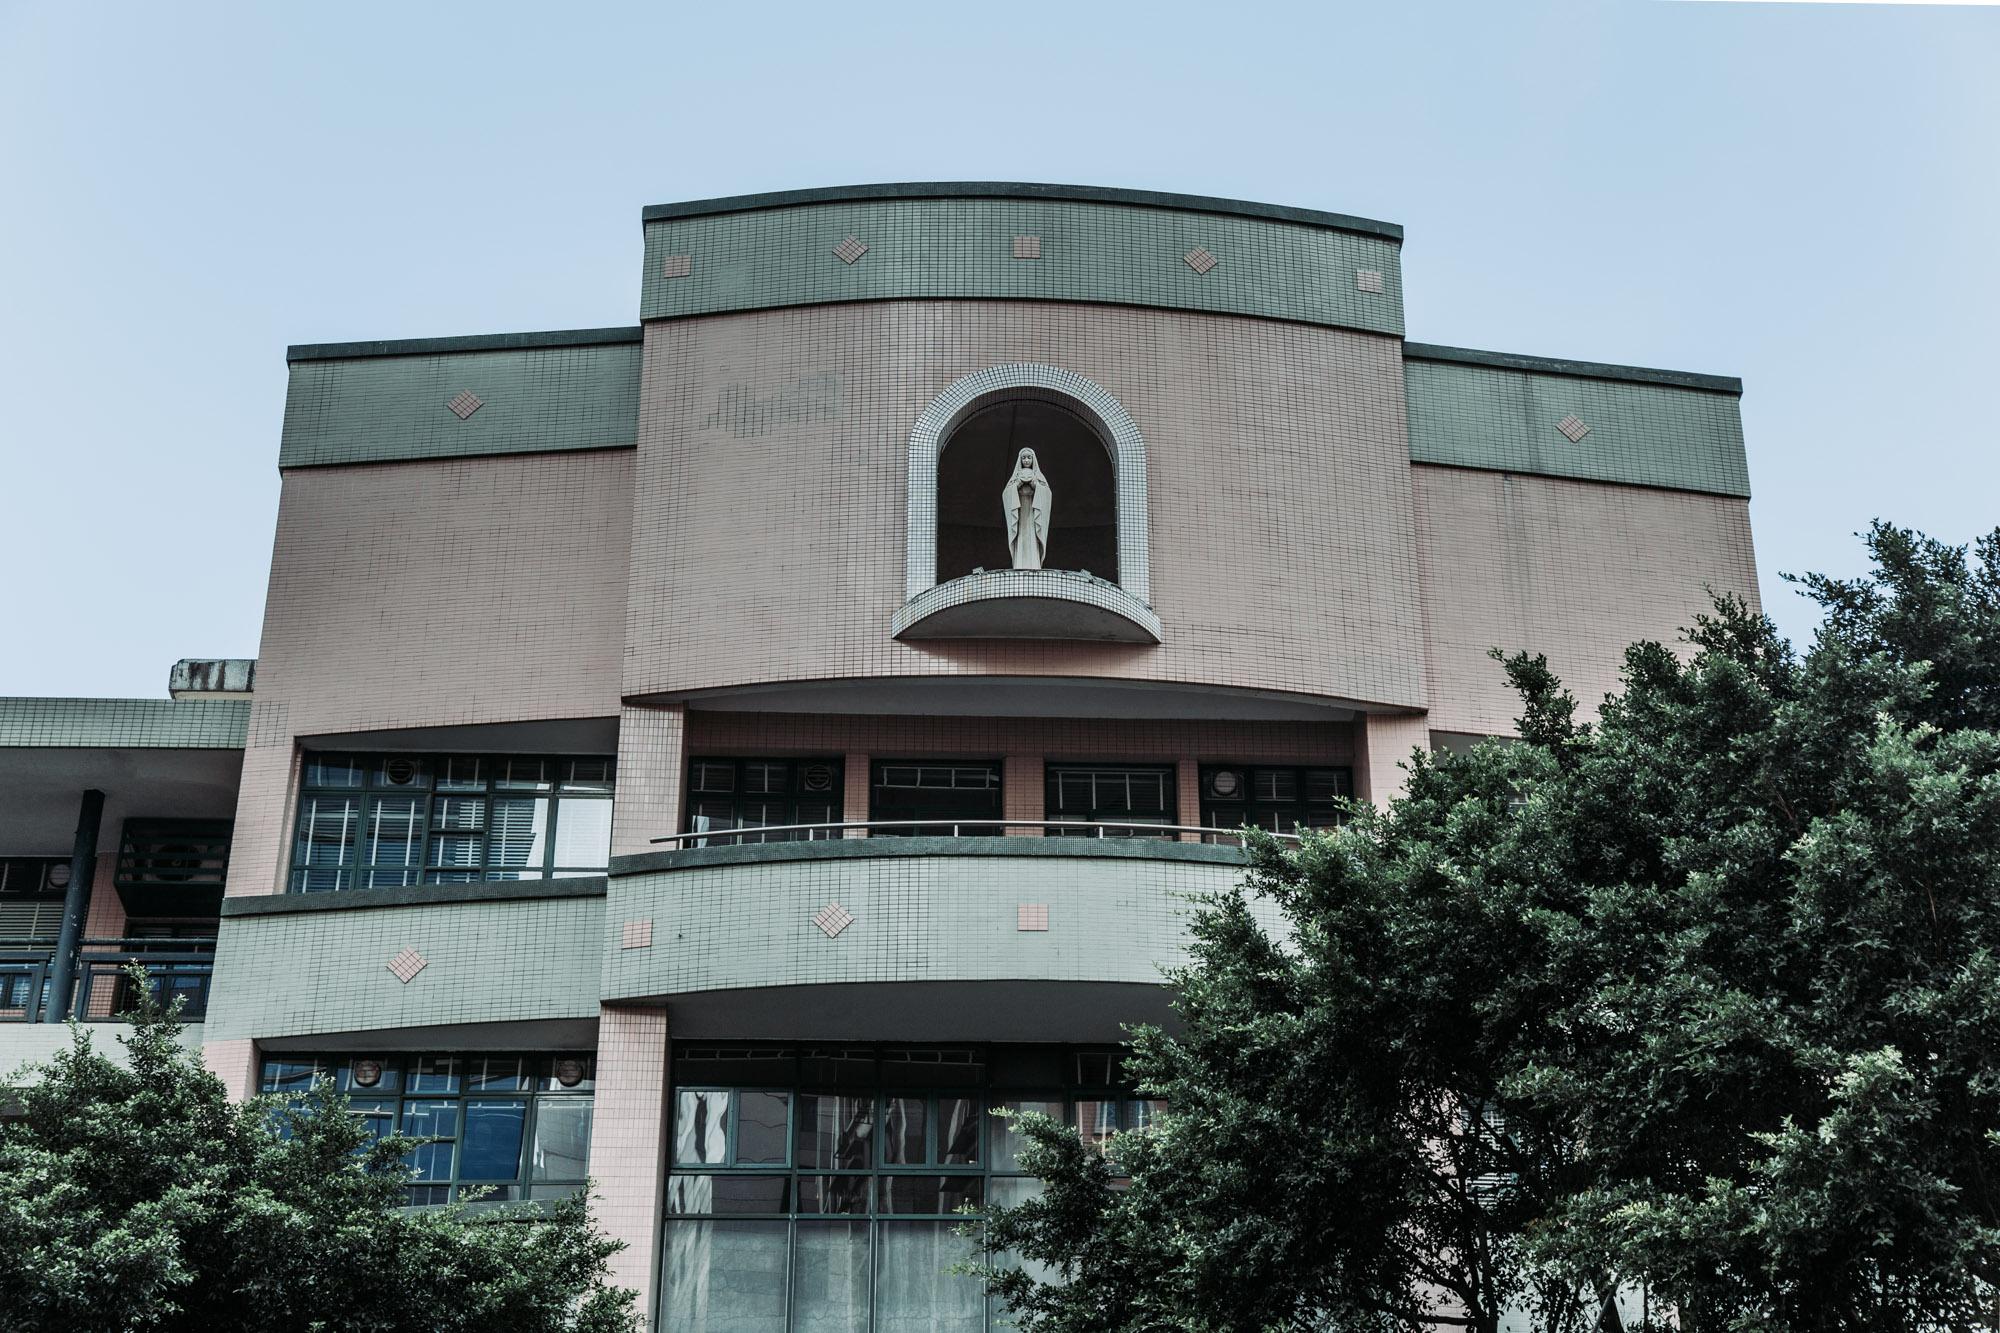 Santa Rosa de Lima Statue Macau Lifestyle